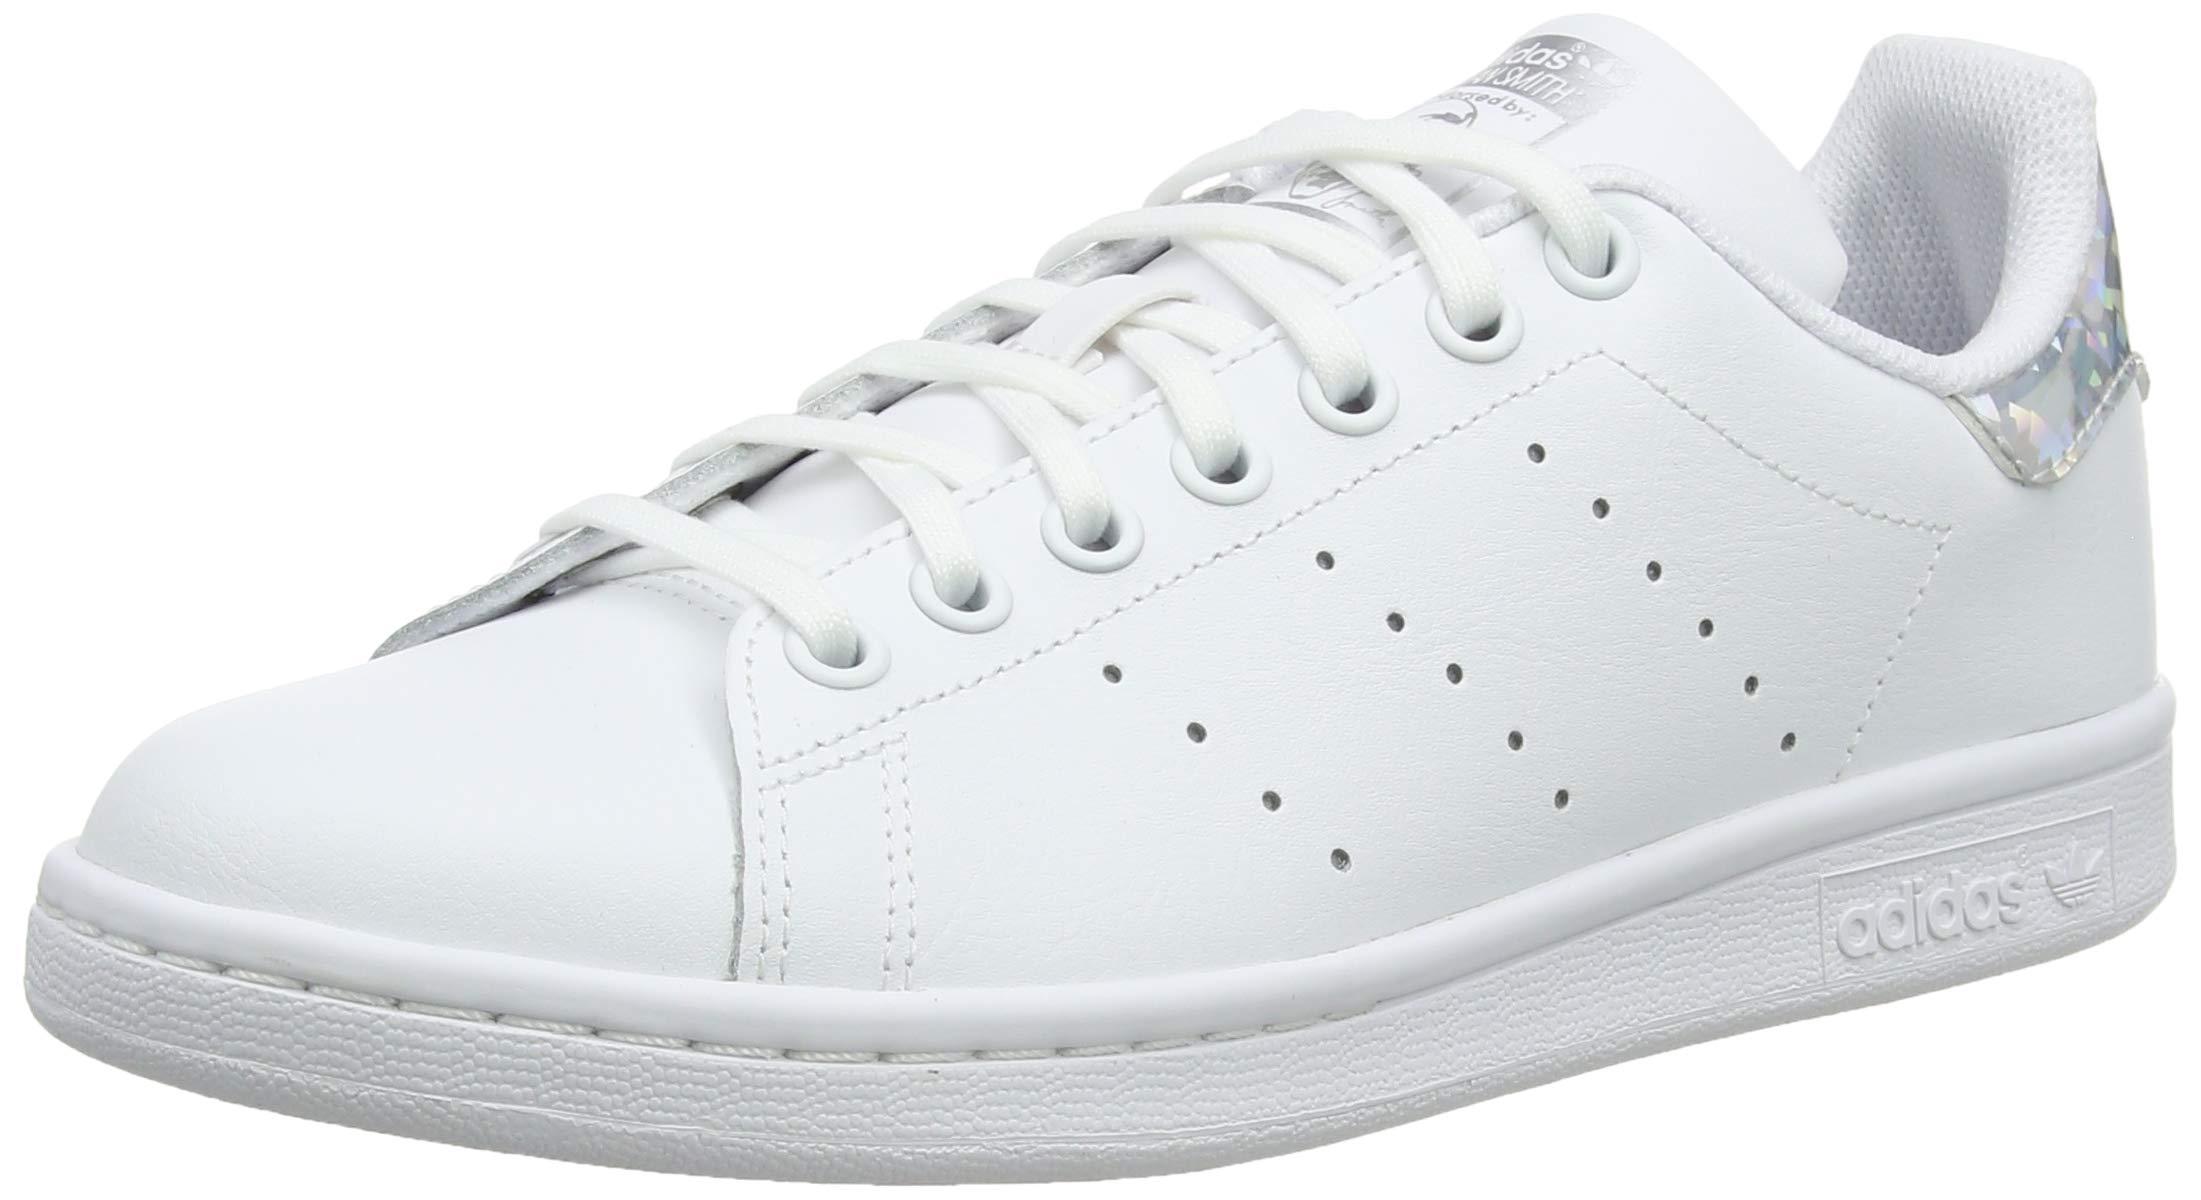 adidas Originals Stan Smith Junior Shoes White/Silver Iridescent 4.5 Big Kid